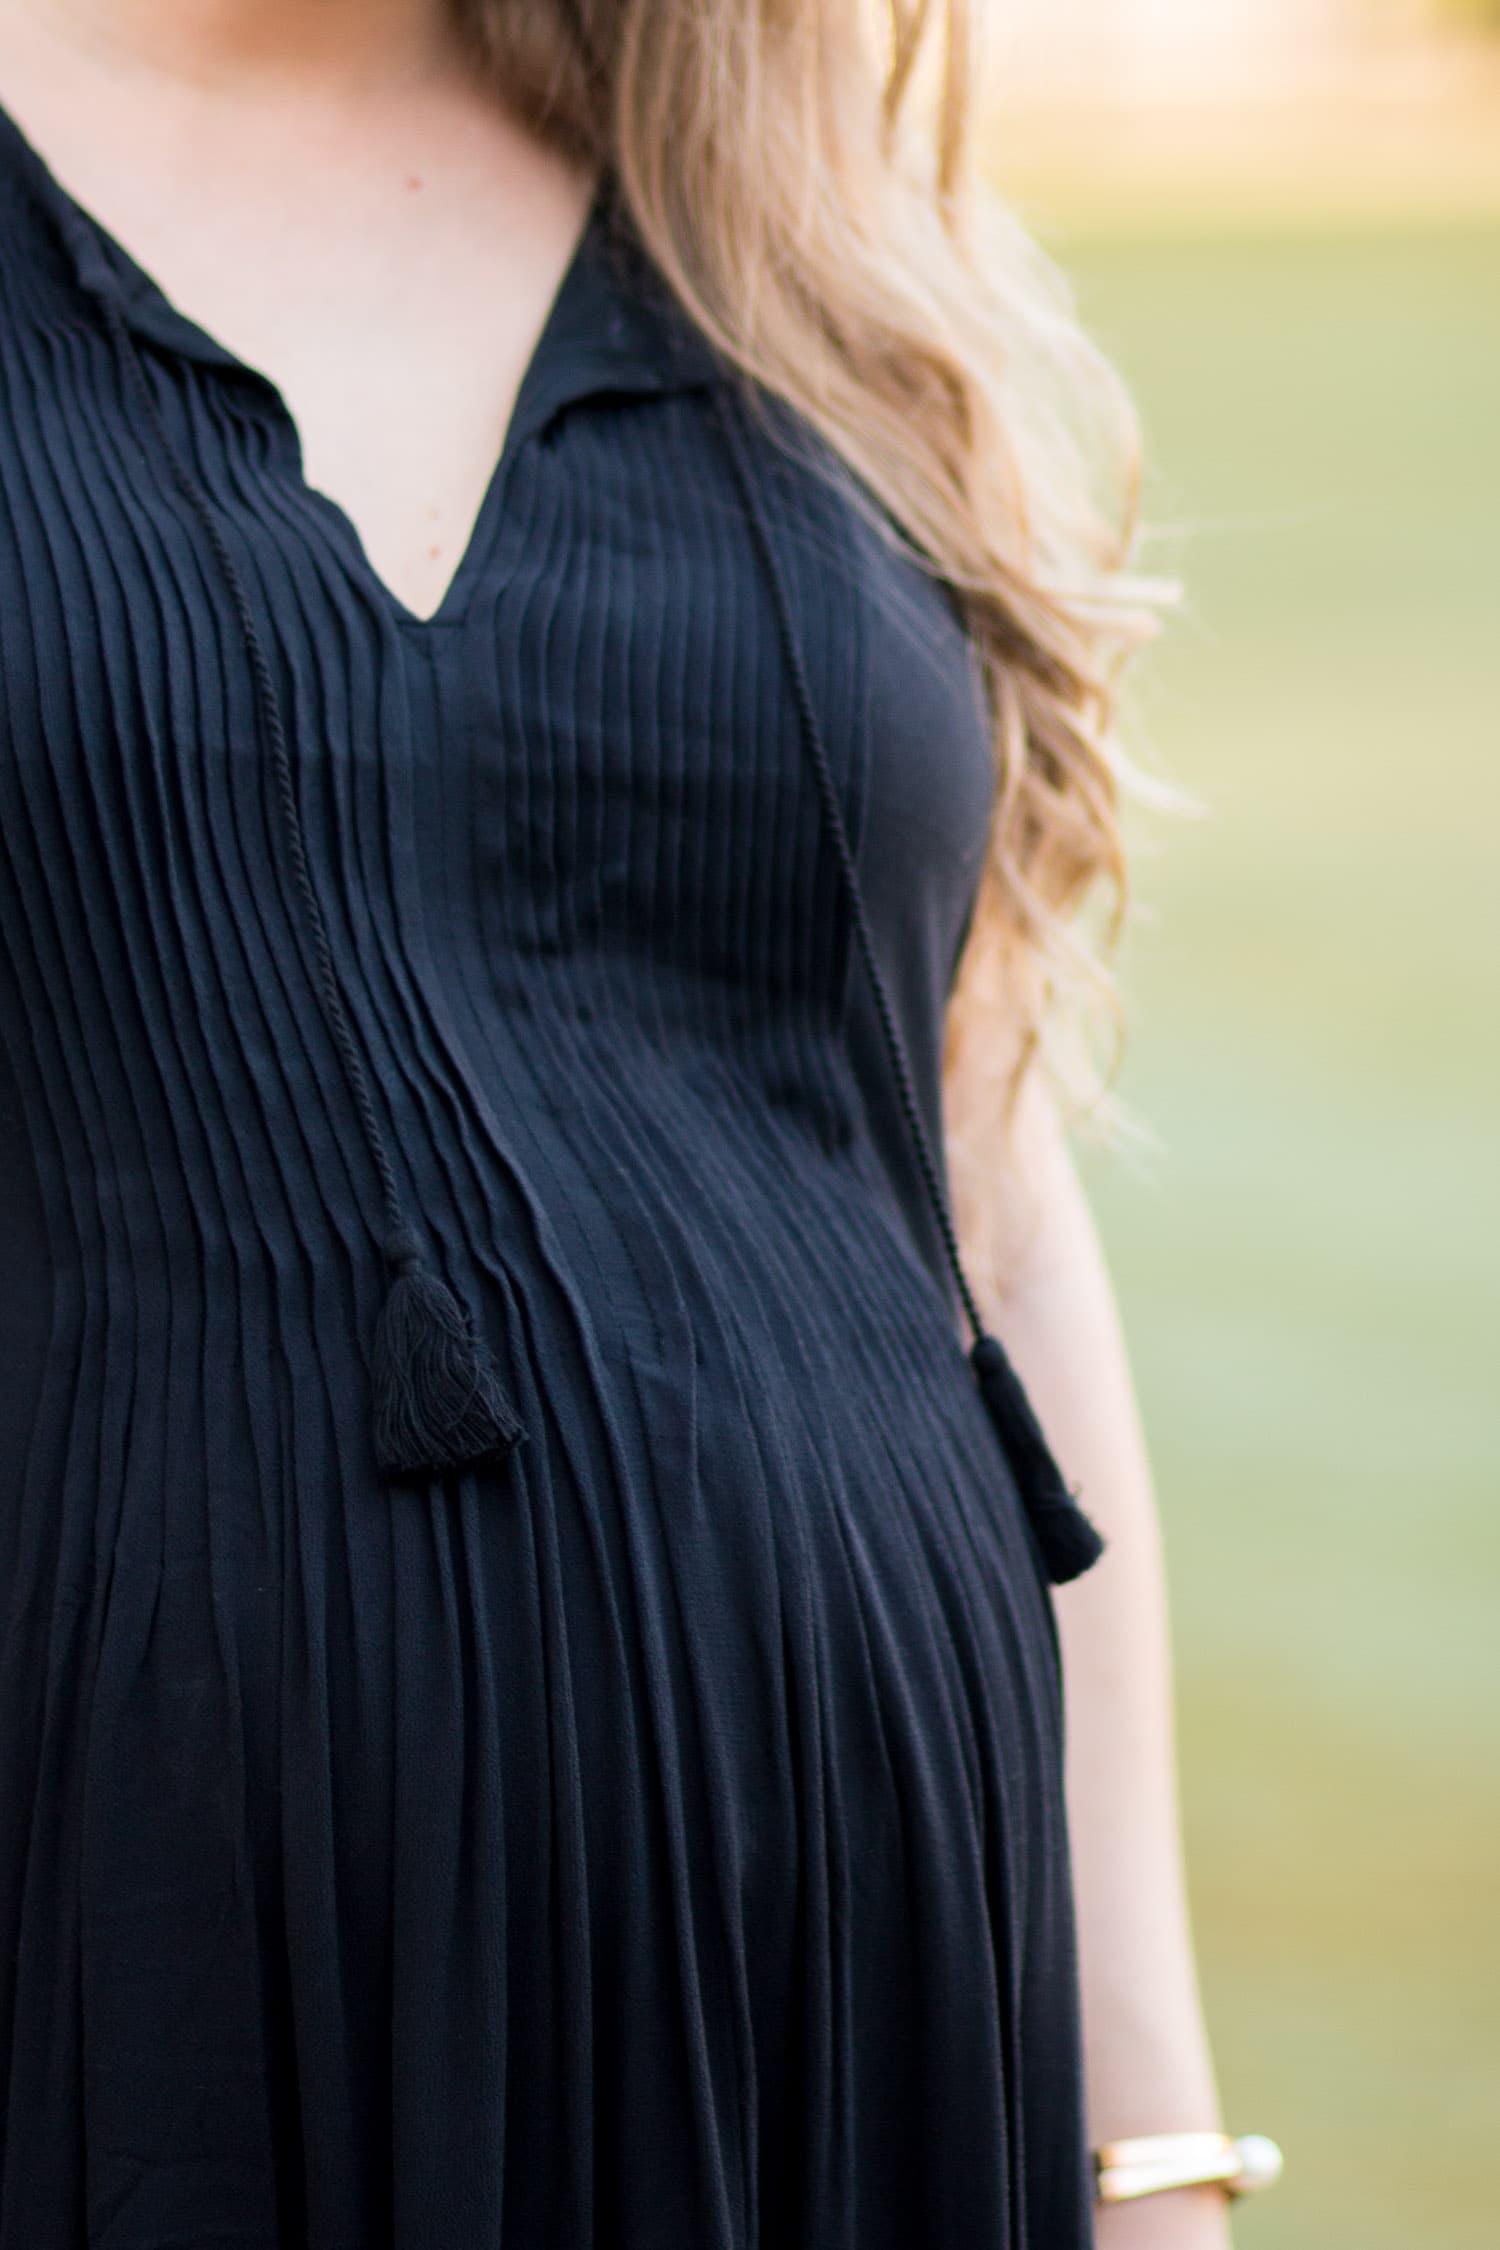 maternity style polka dot sun dress black heels zappos shoes | Ashley Brooke Nicholas Florida style blogger